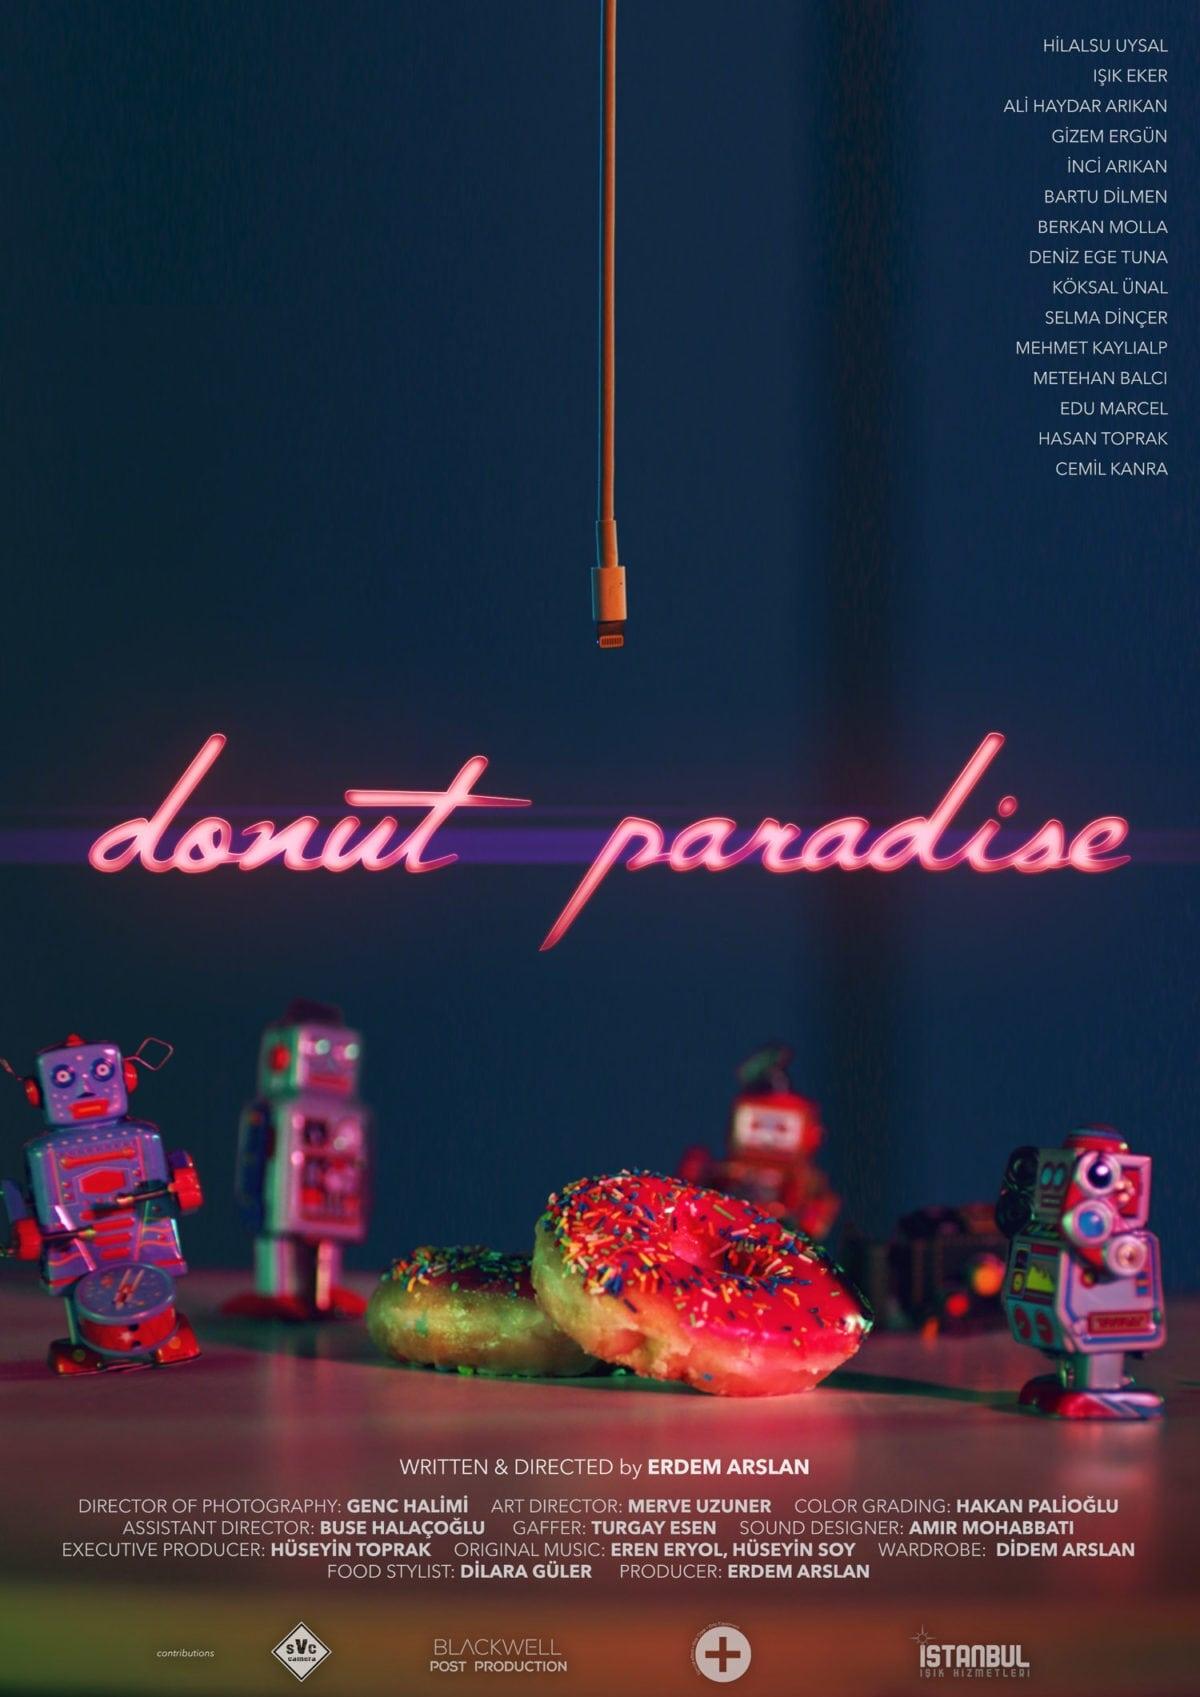 Donut Paradise